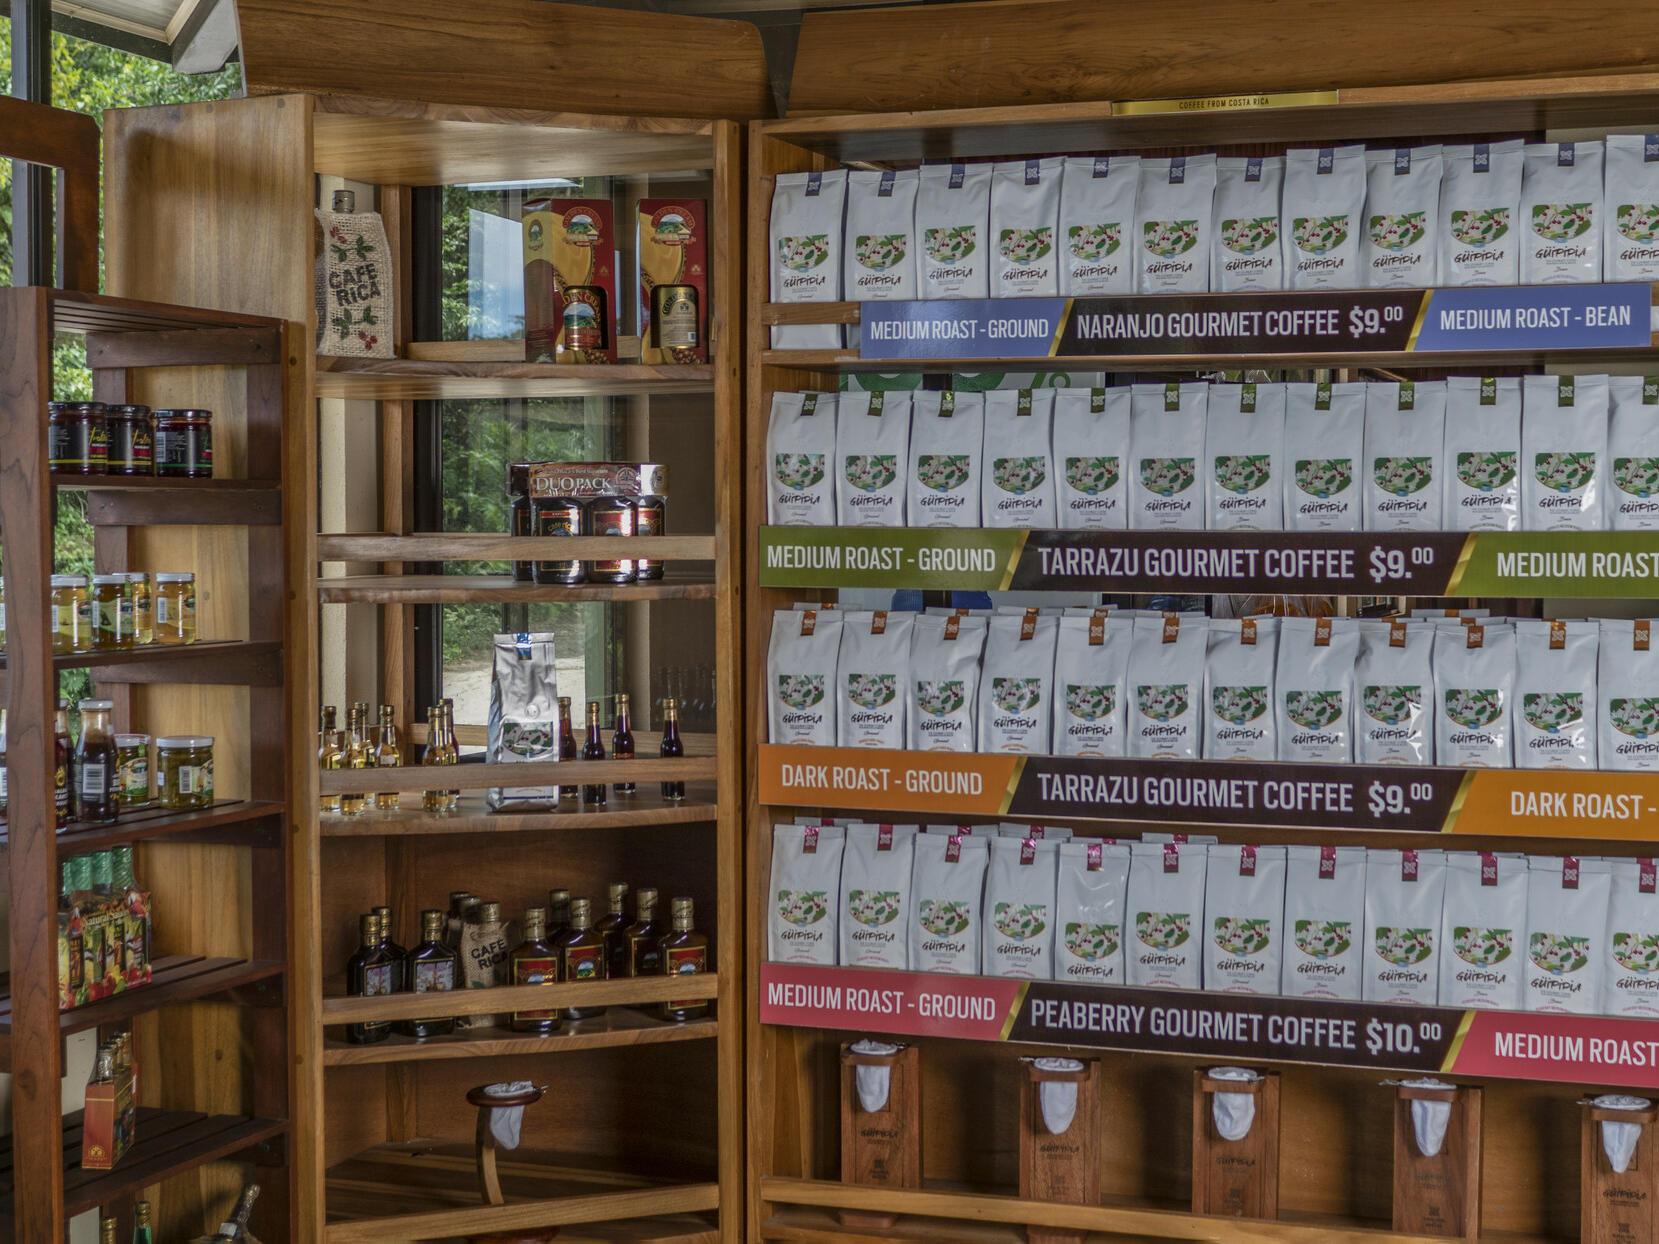 Coffee Shop with Many Coffee Types at Buena Vista Del Rincon